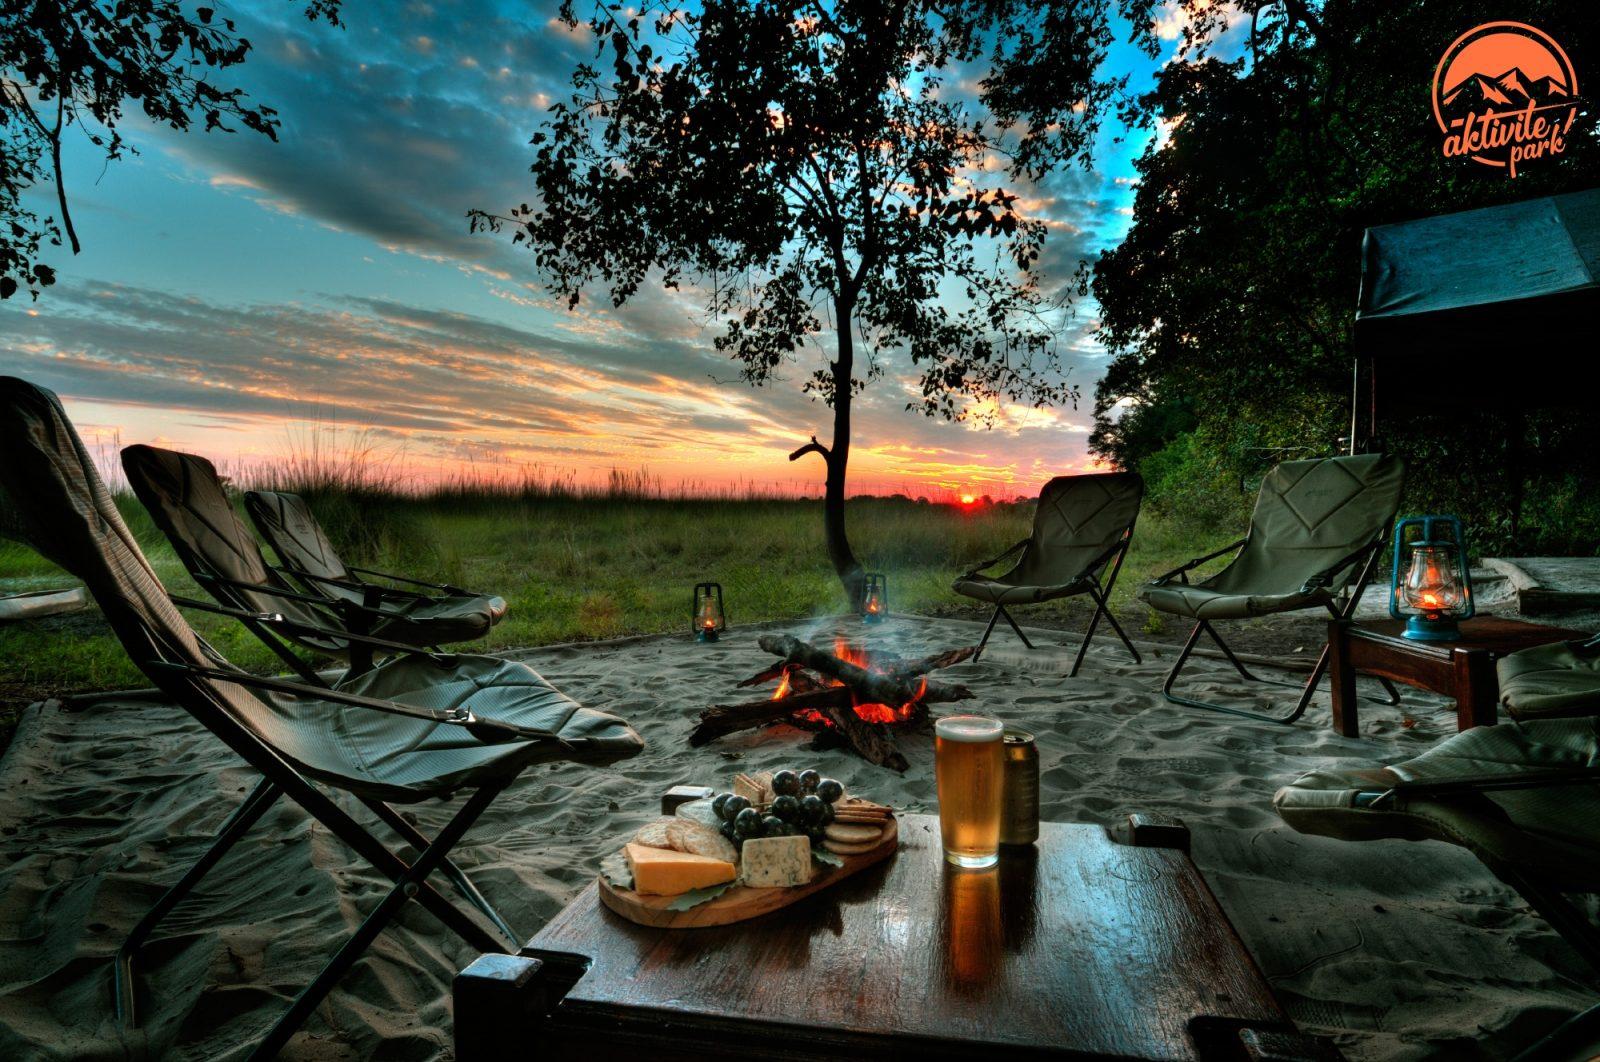 Yalova Camping